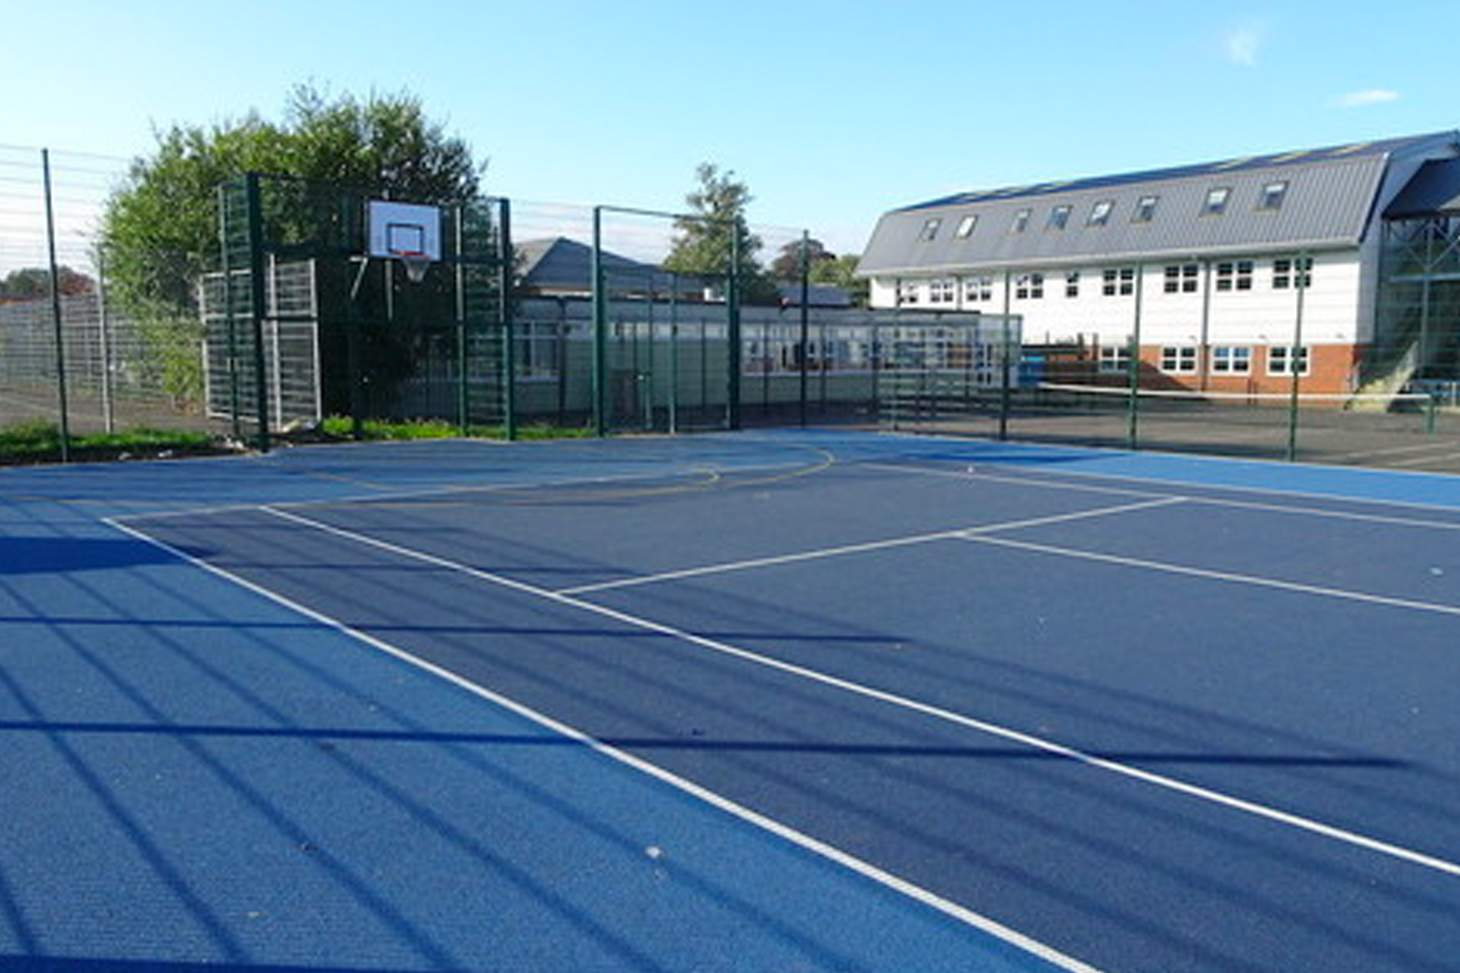 Wilmington Grammar School for Boys Court | Hard (macadam) basketball court